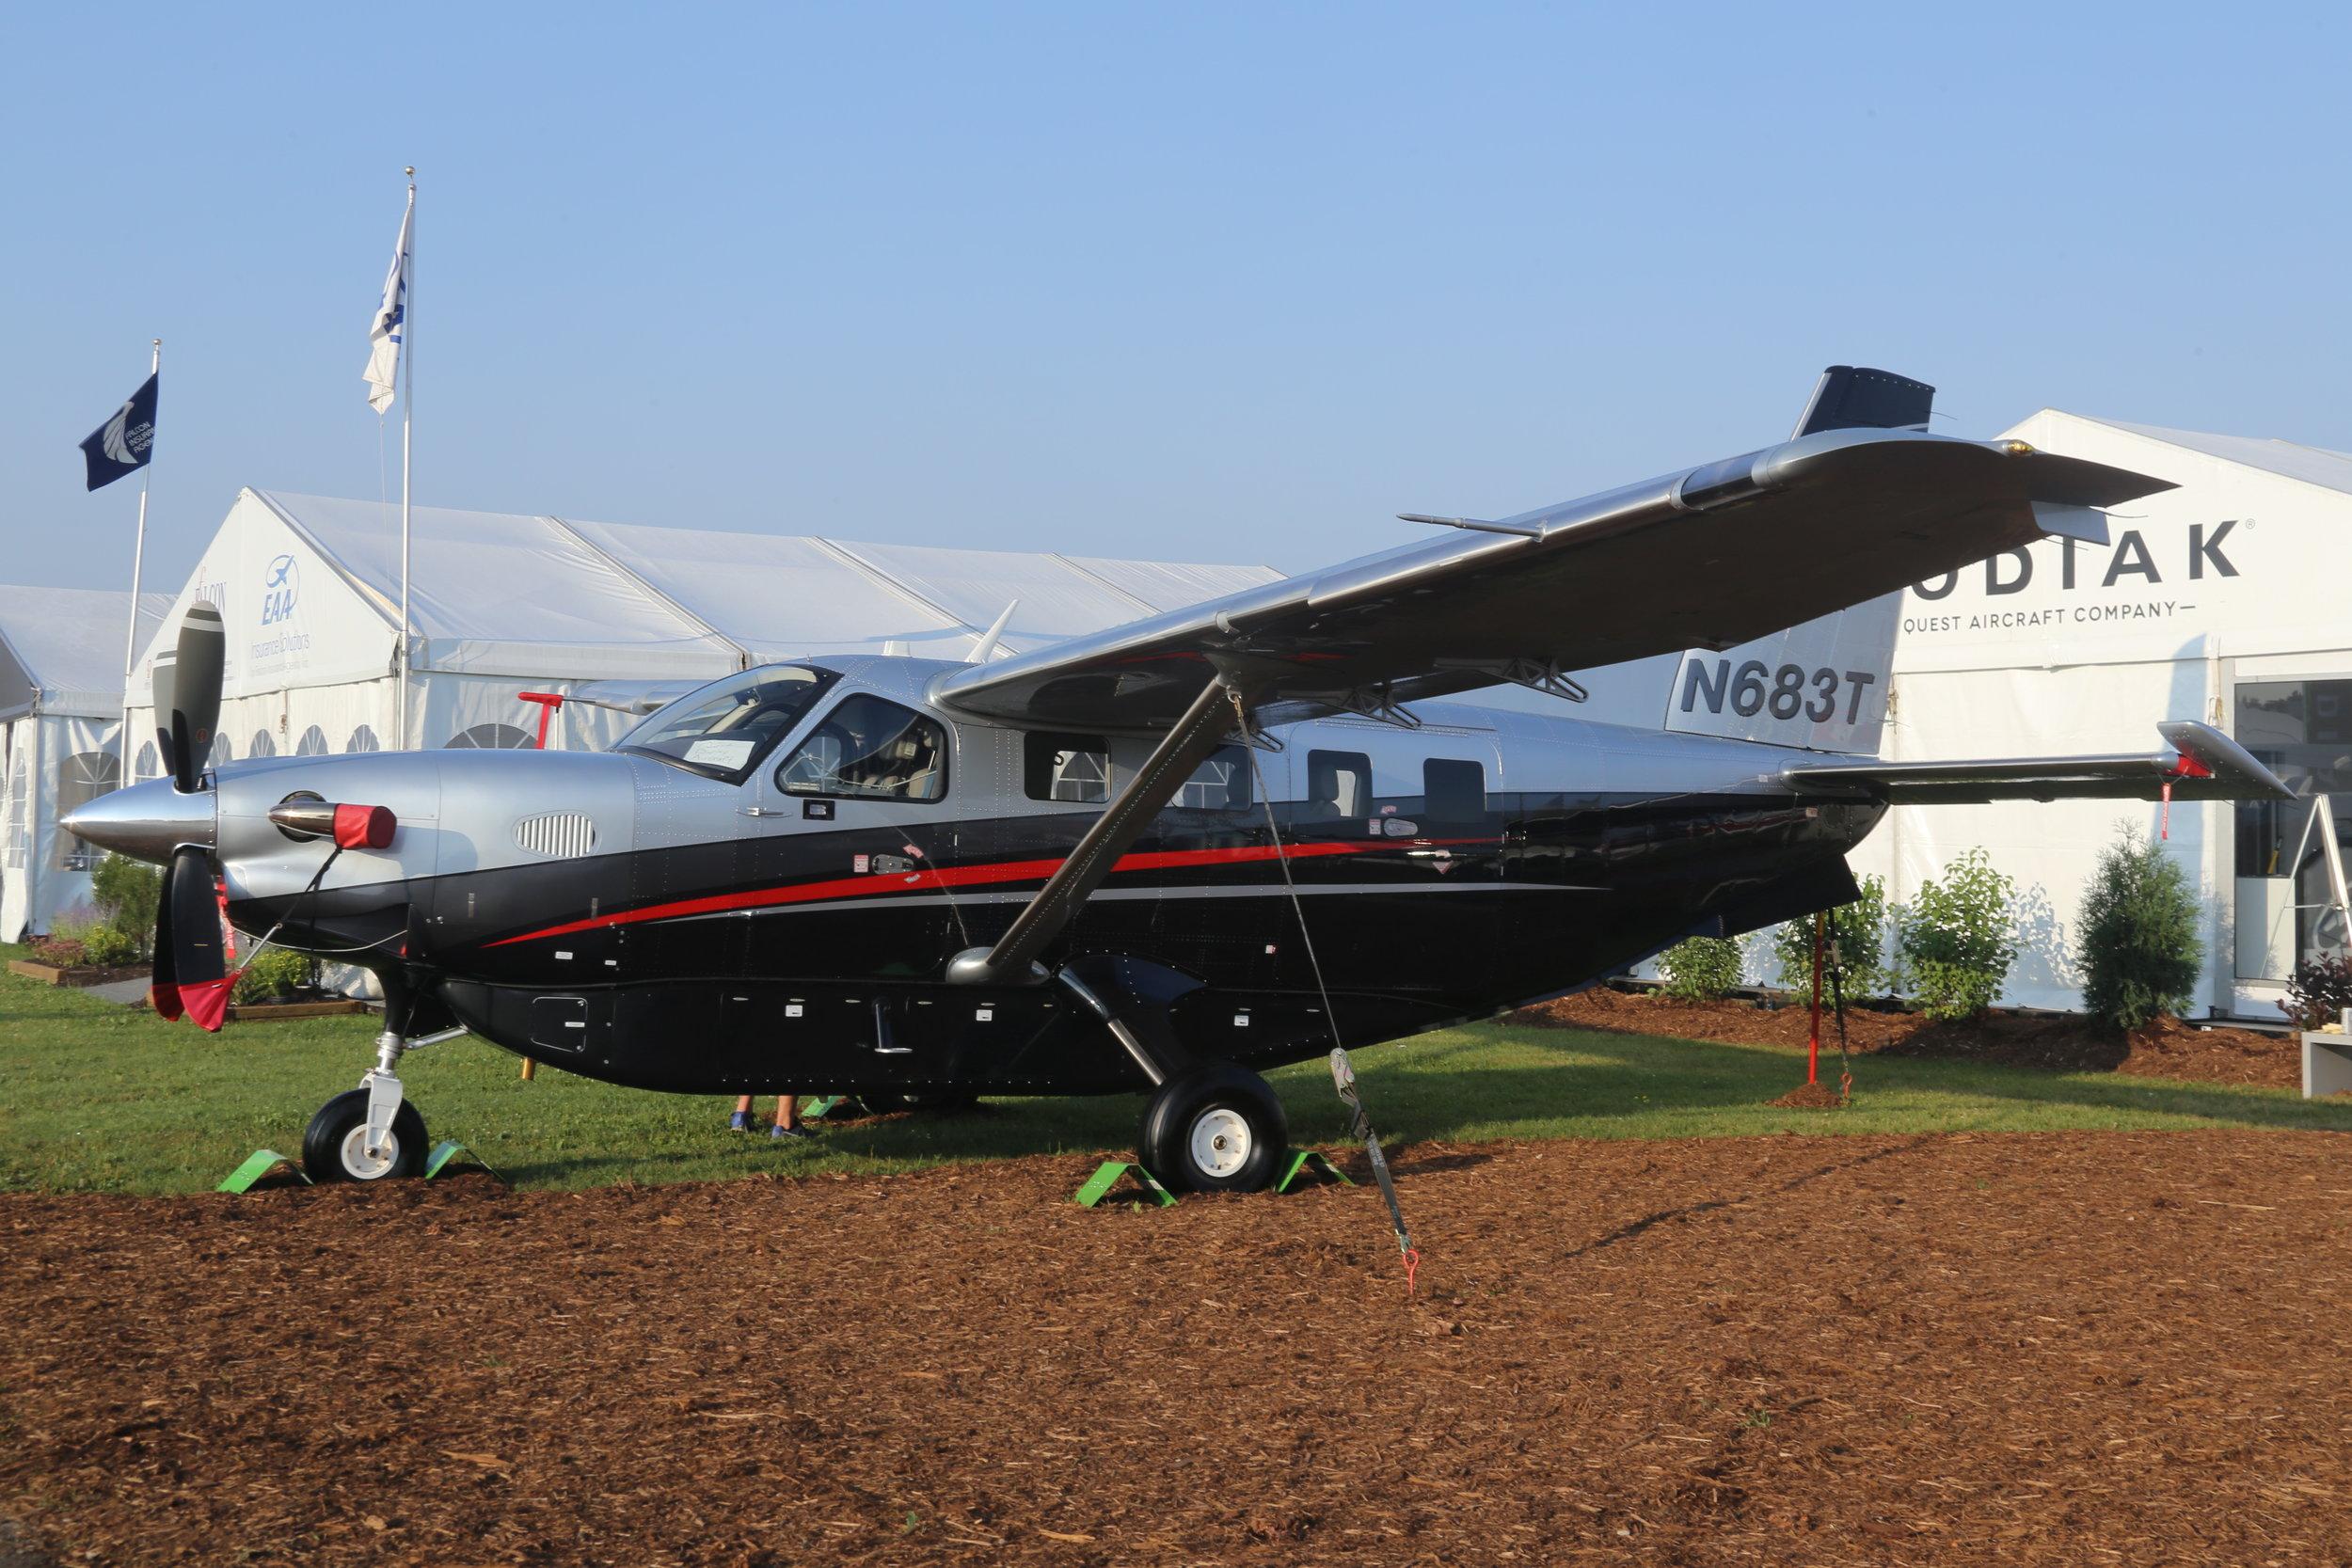 N683T Quest Aircraft Company Kodiak 100 taken at Oshkosh 24th July 2018 by John Wood